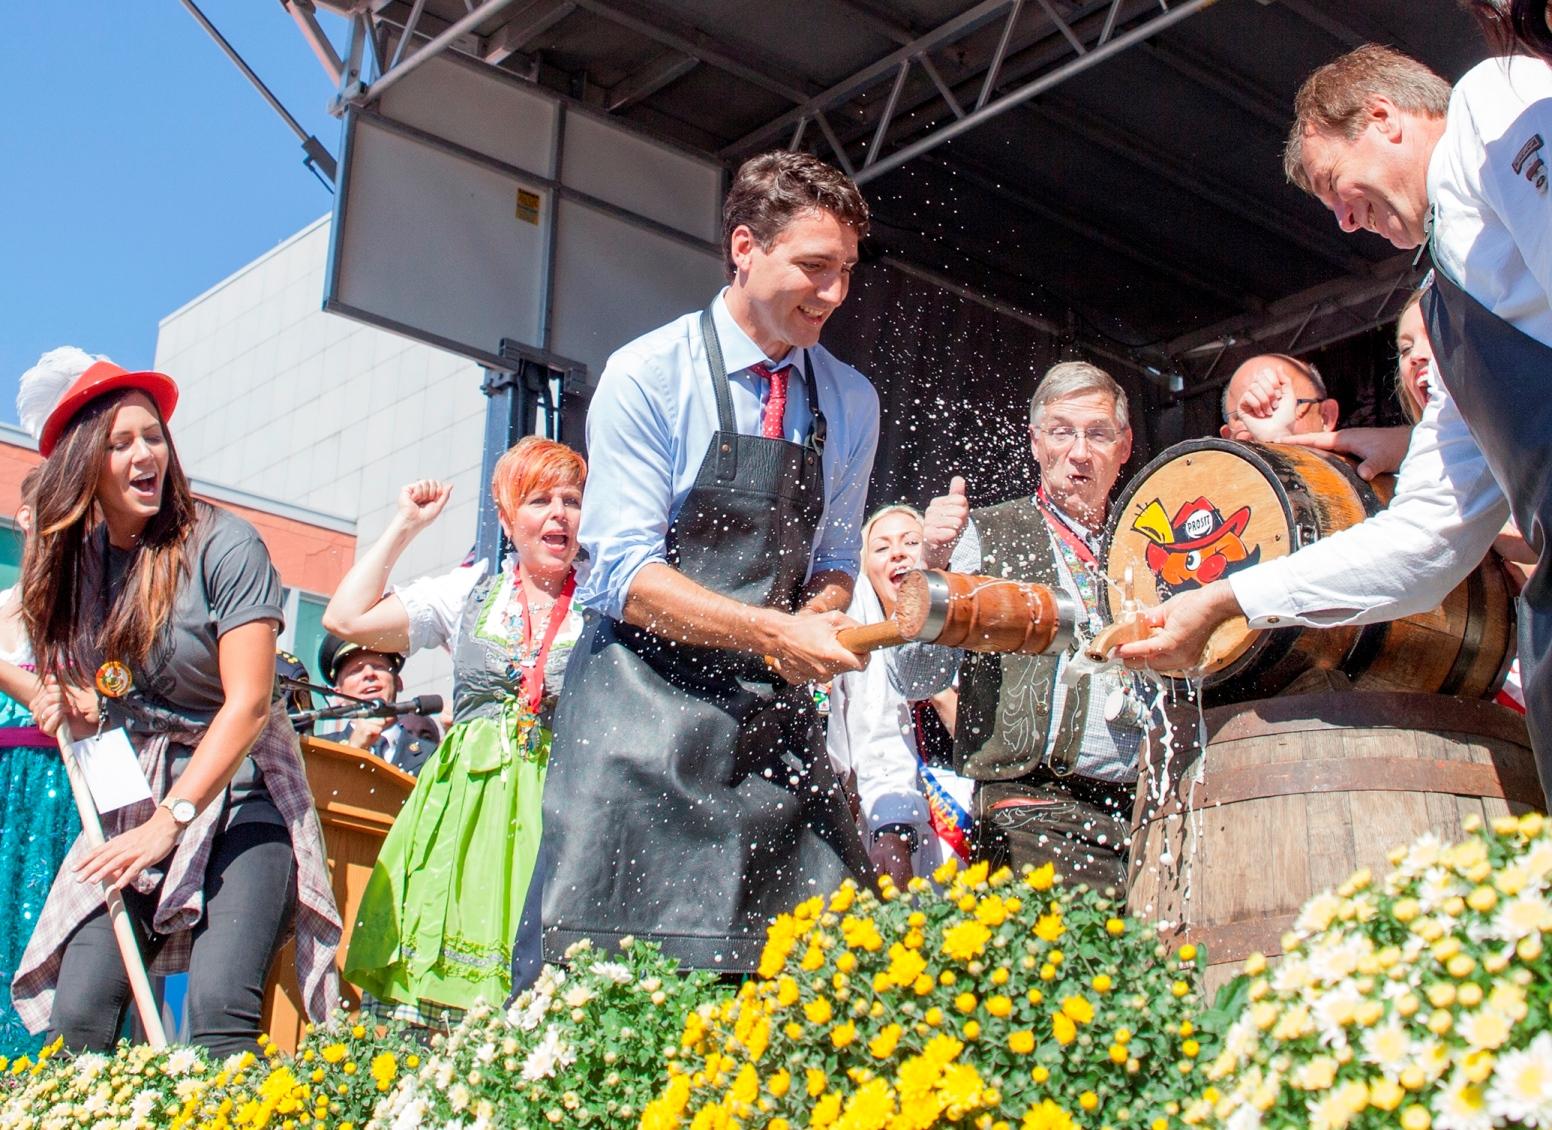 Oktoberfest fun in Kitchener